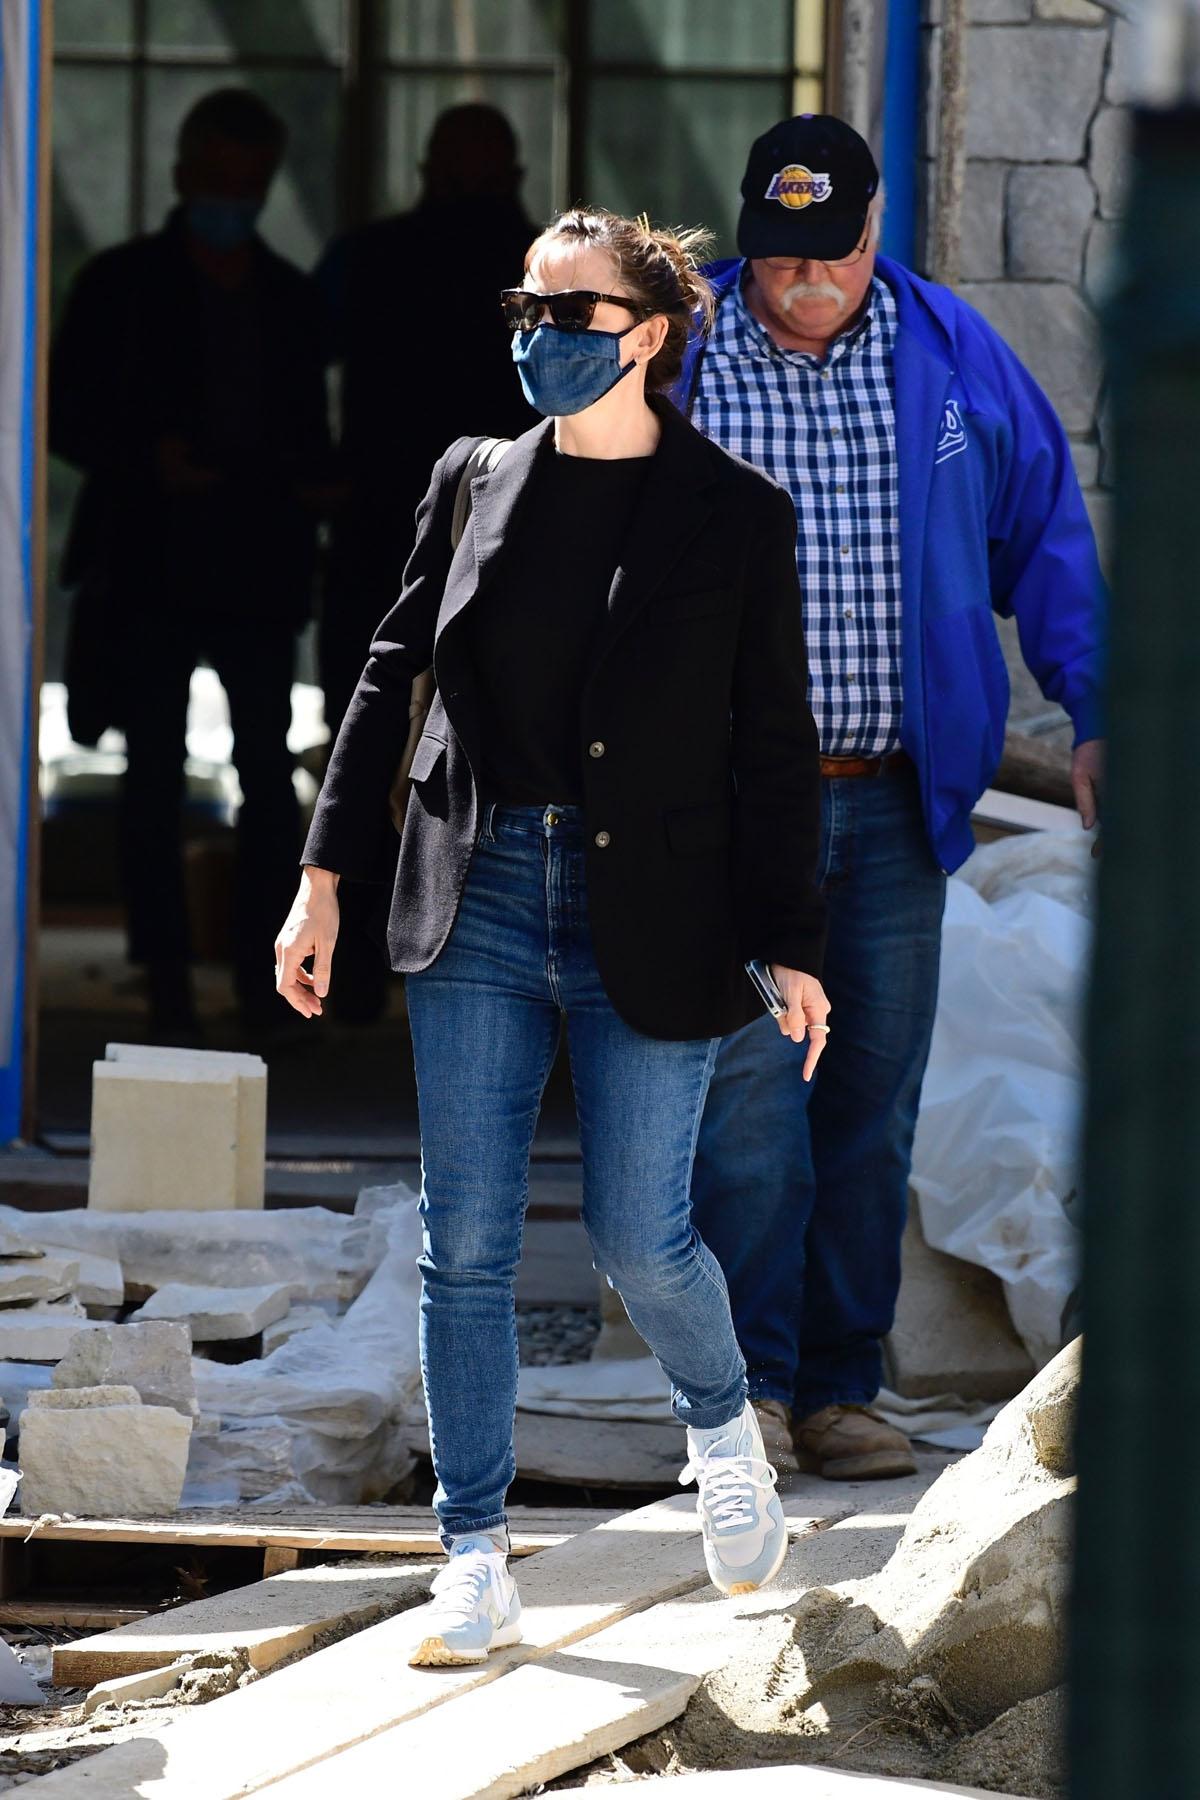 Jennifer Garner visits her house under construction before a trip to her office